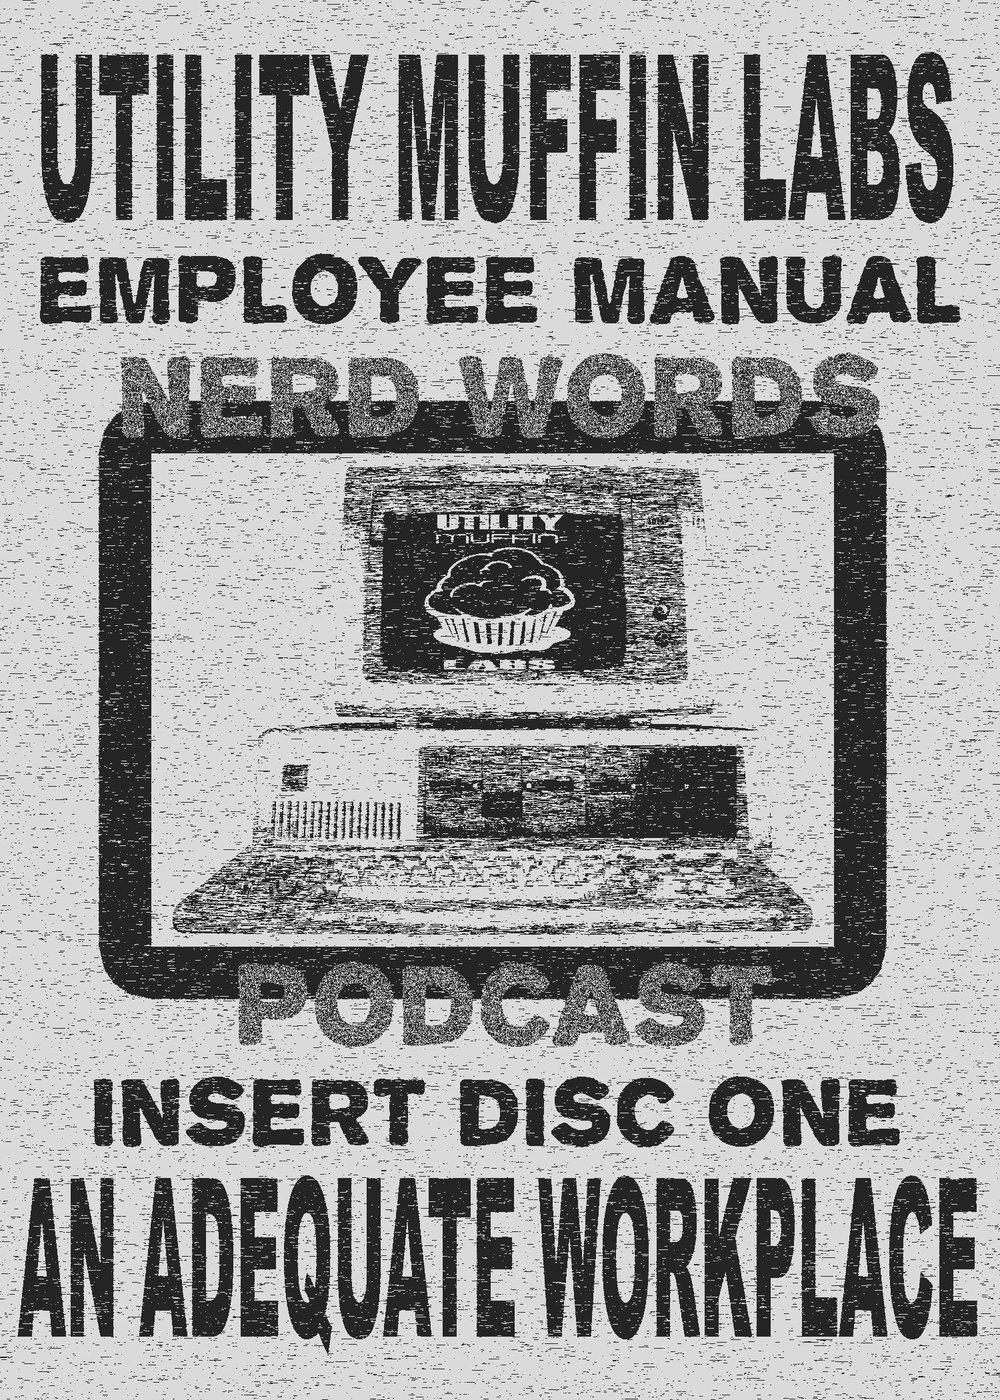 employee manual.jpg